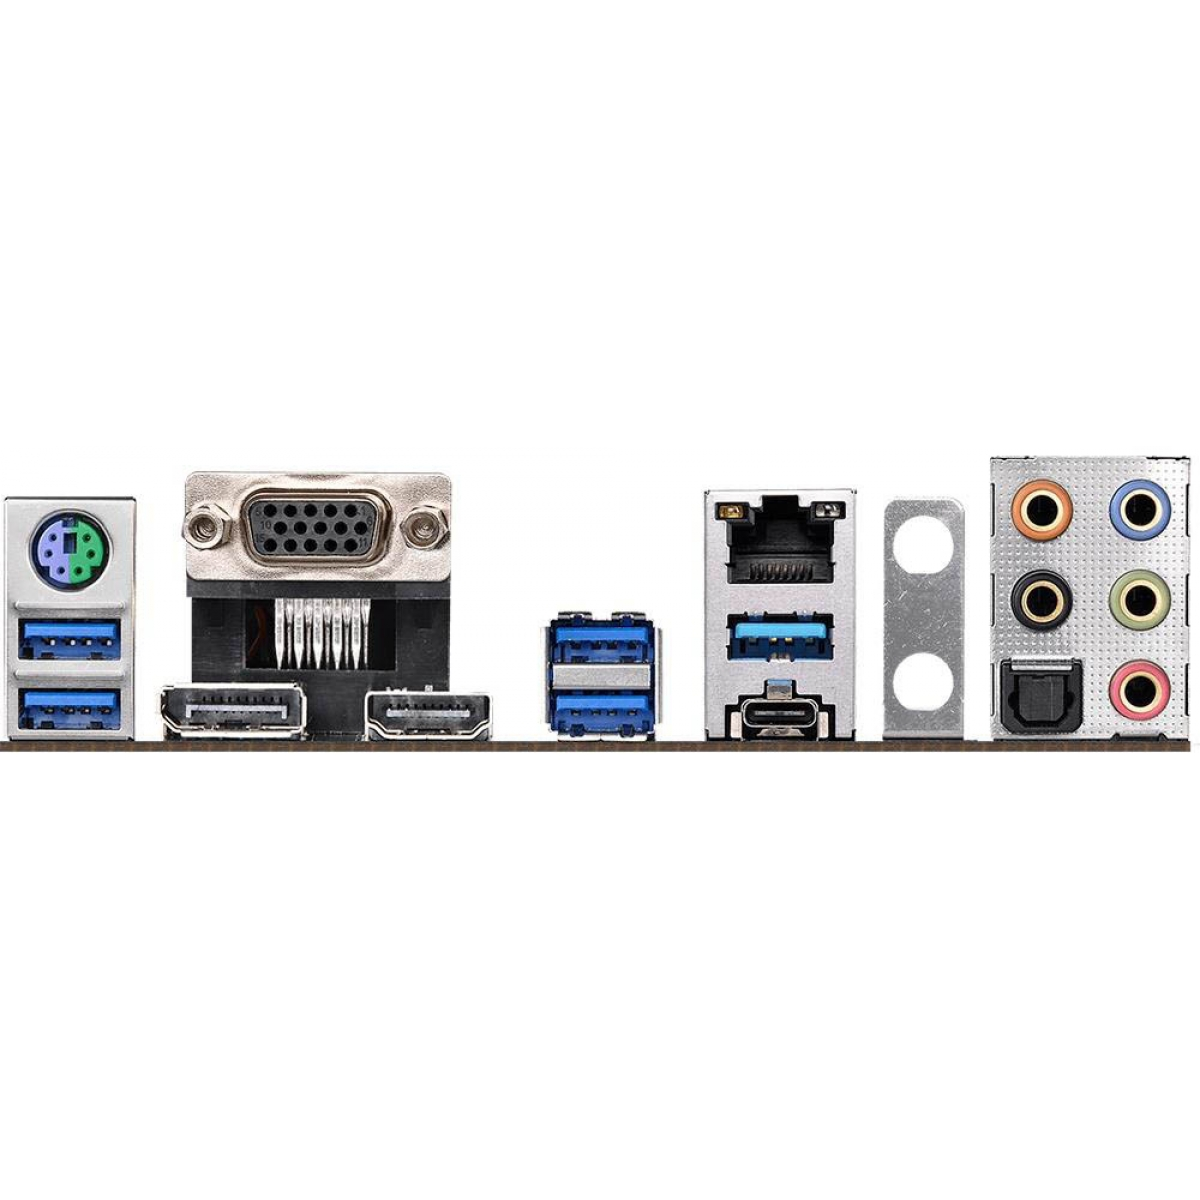 Placa Mãe ASRock Z390 Extreme 4, Chipset Z390, Intel LGA 1151, ATX, DDR4